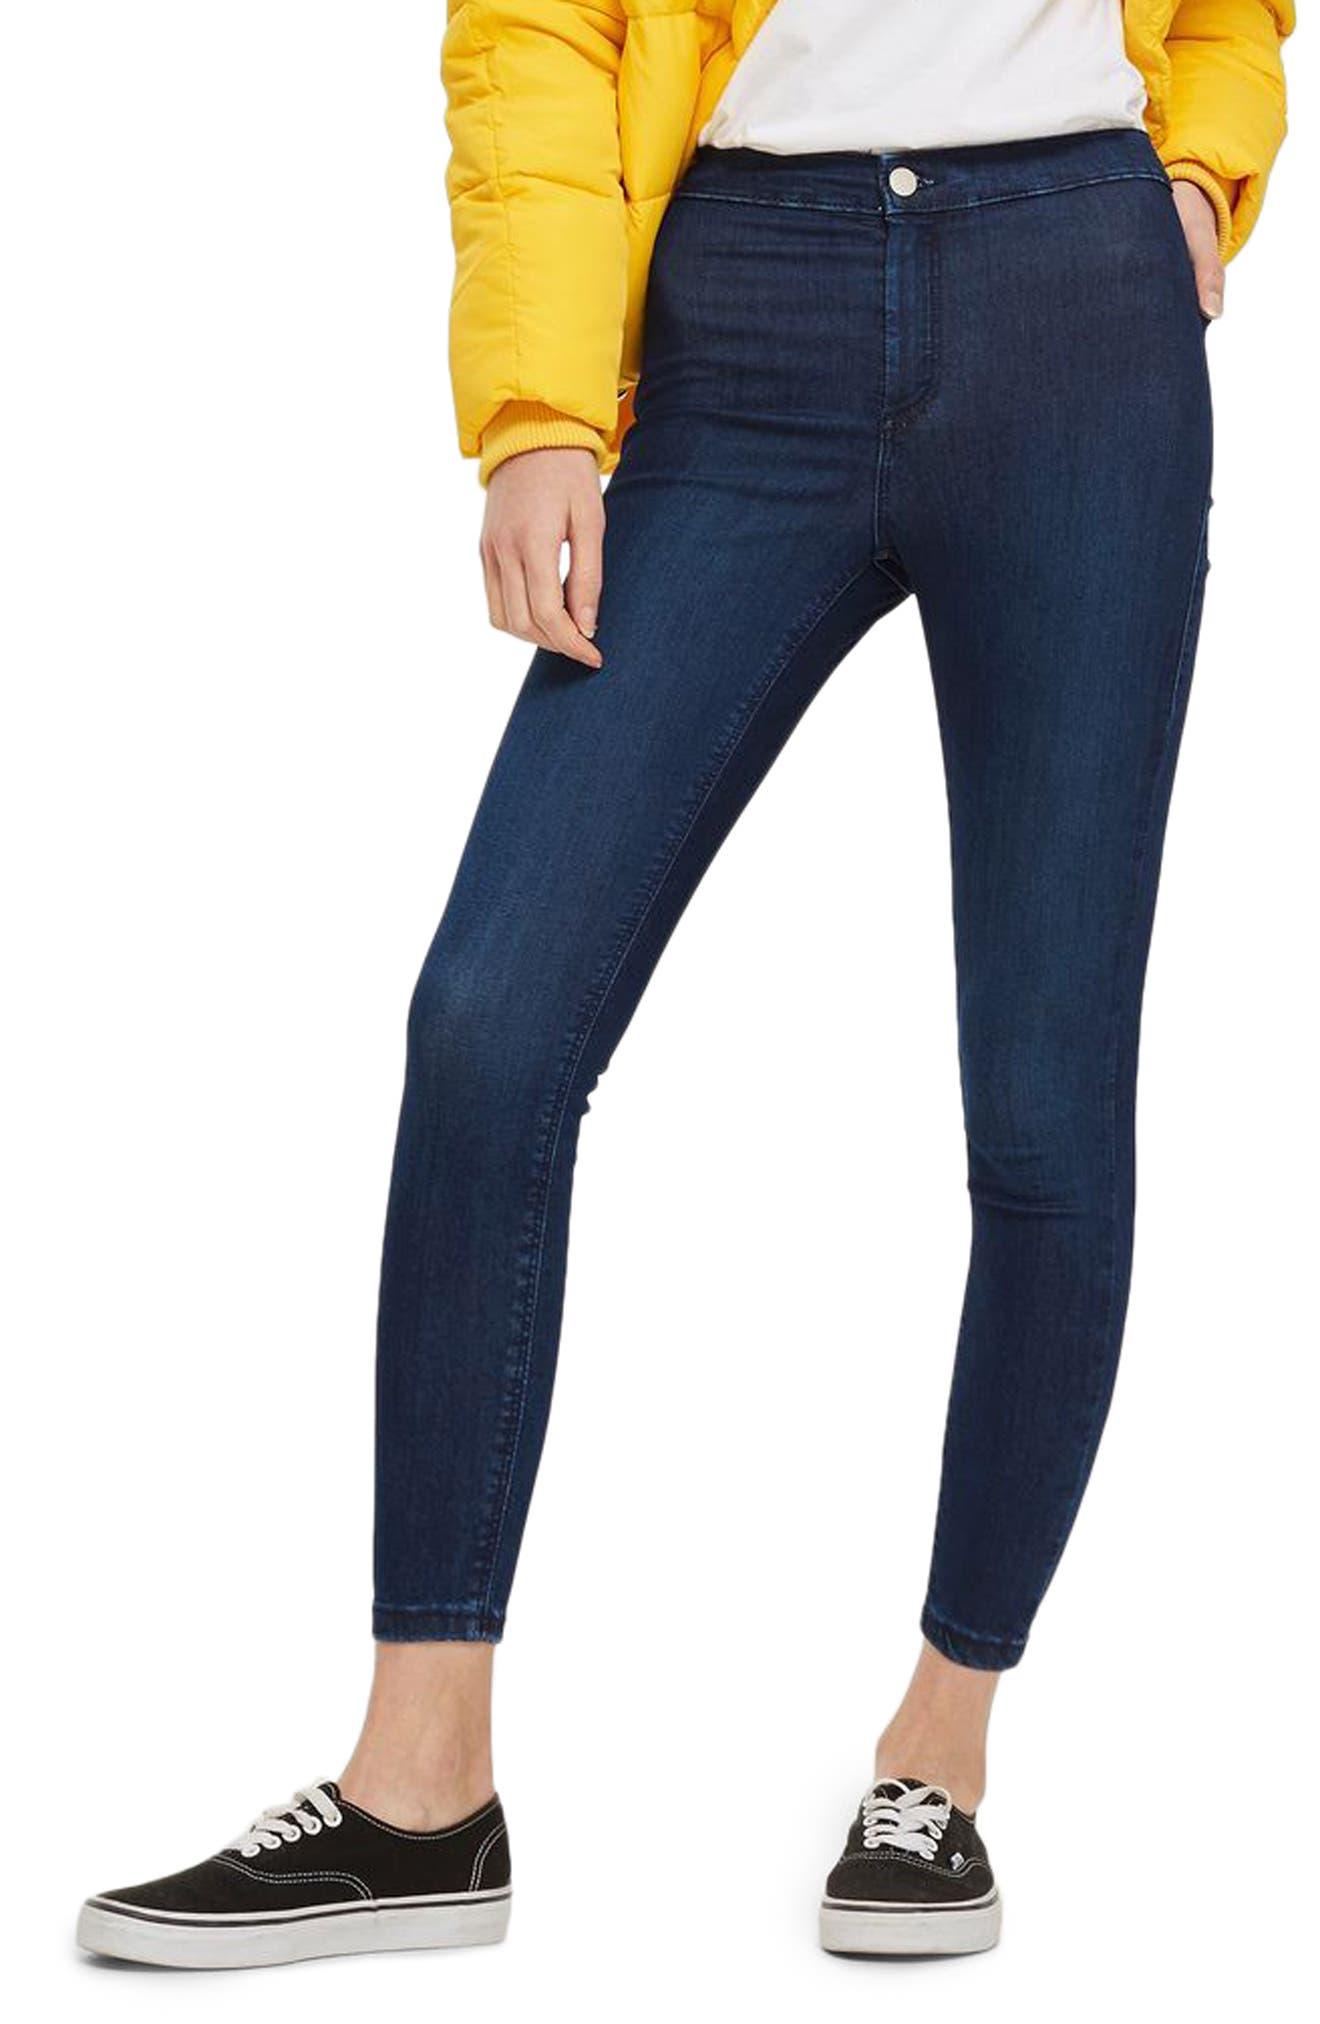 Joni High Waist Skinny Jeans,                             Main thumbnail 1, color,                             400